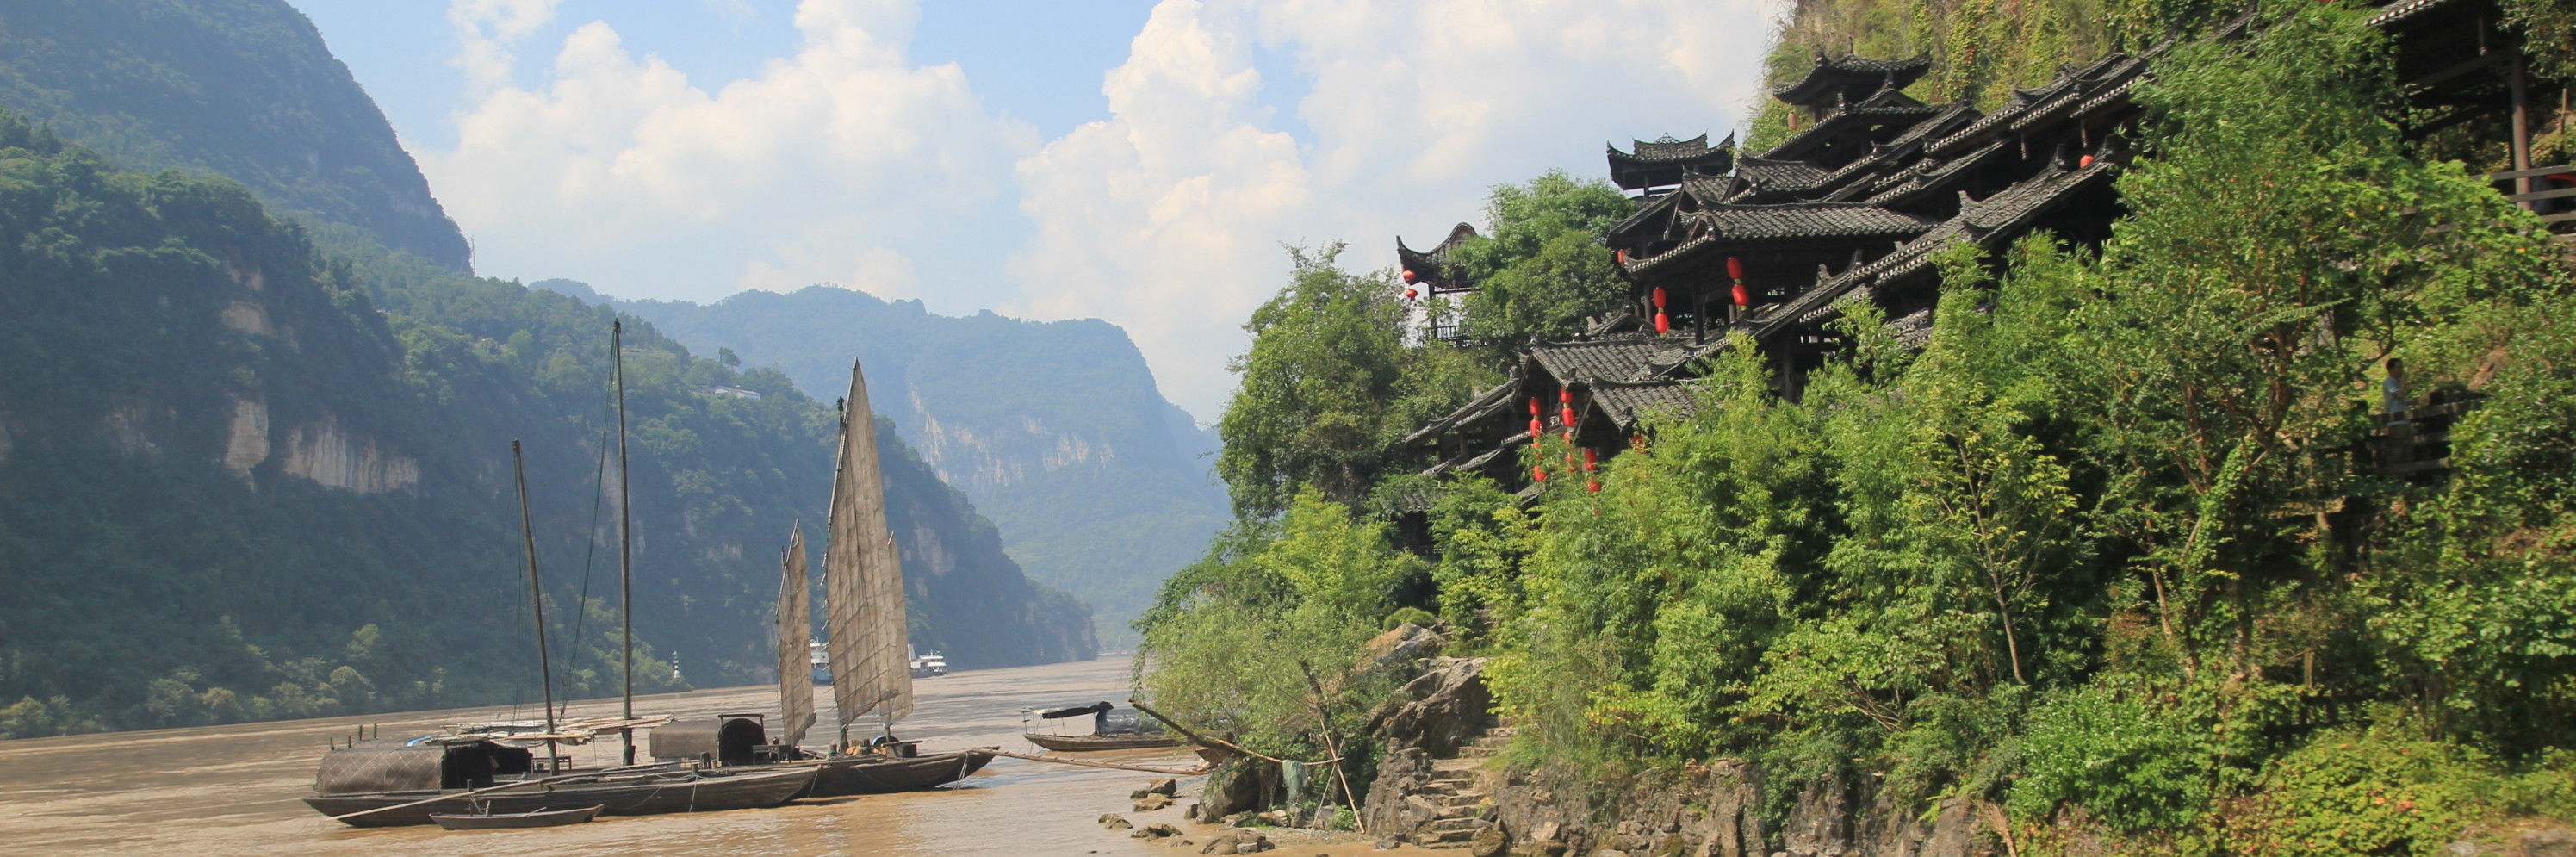 yangtze river sanxia tribe